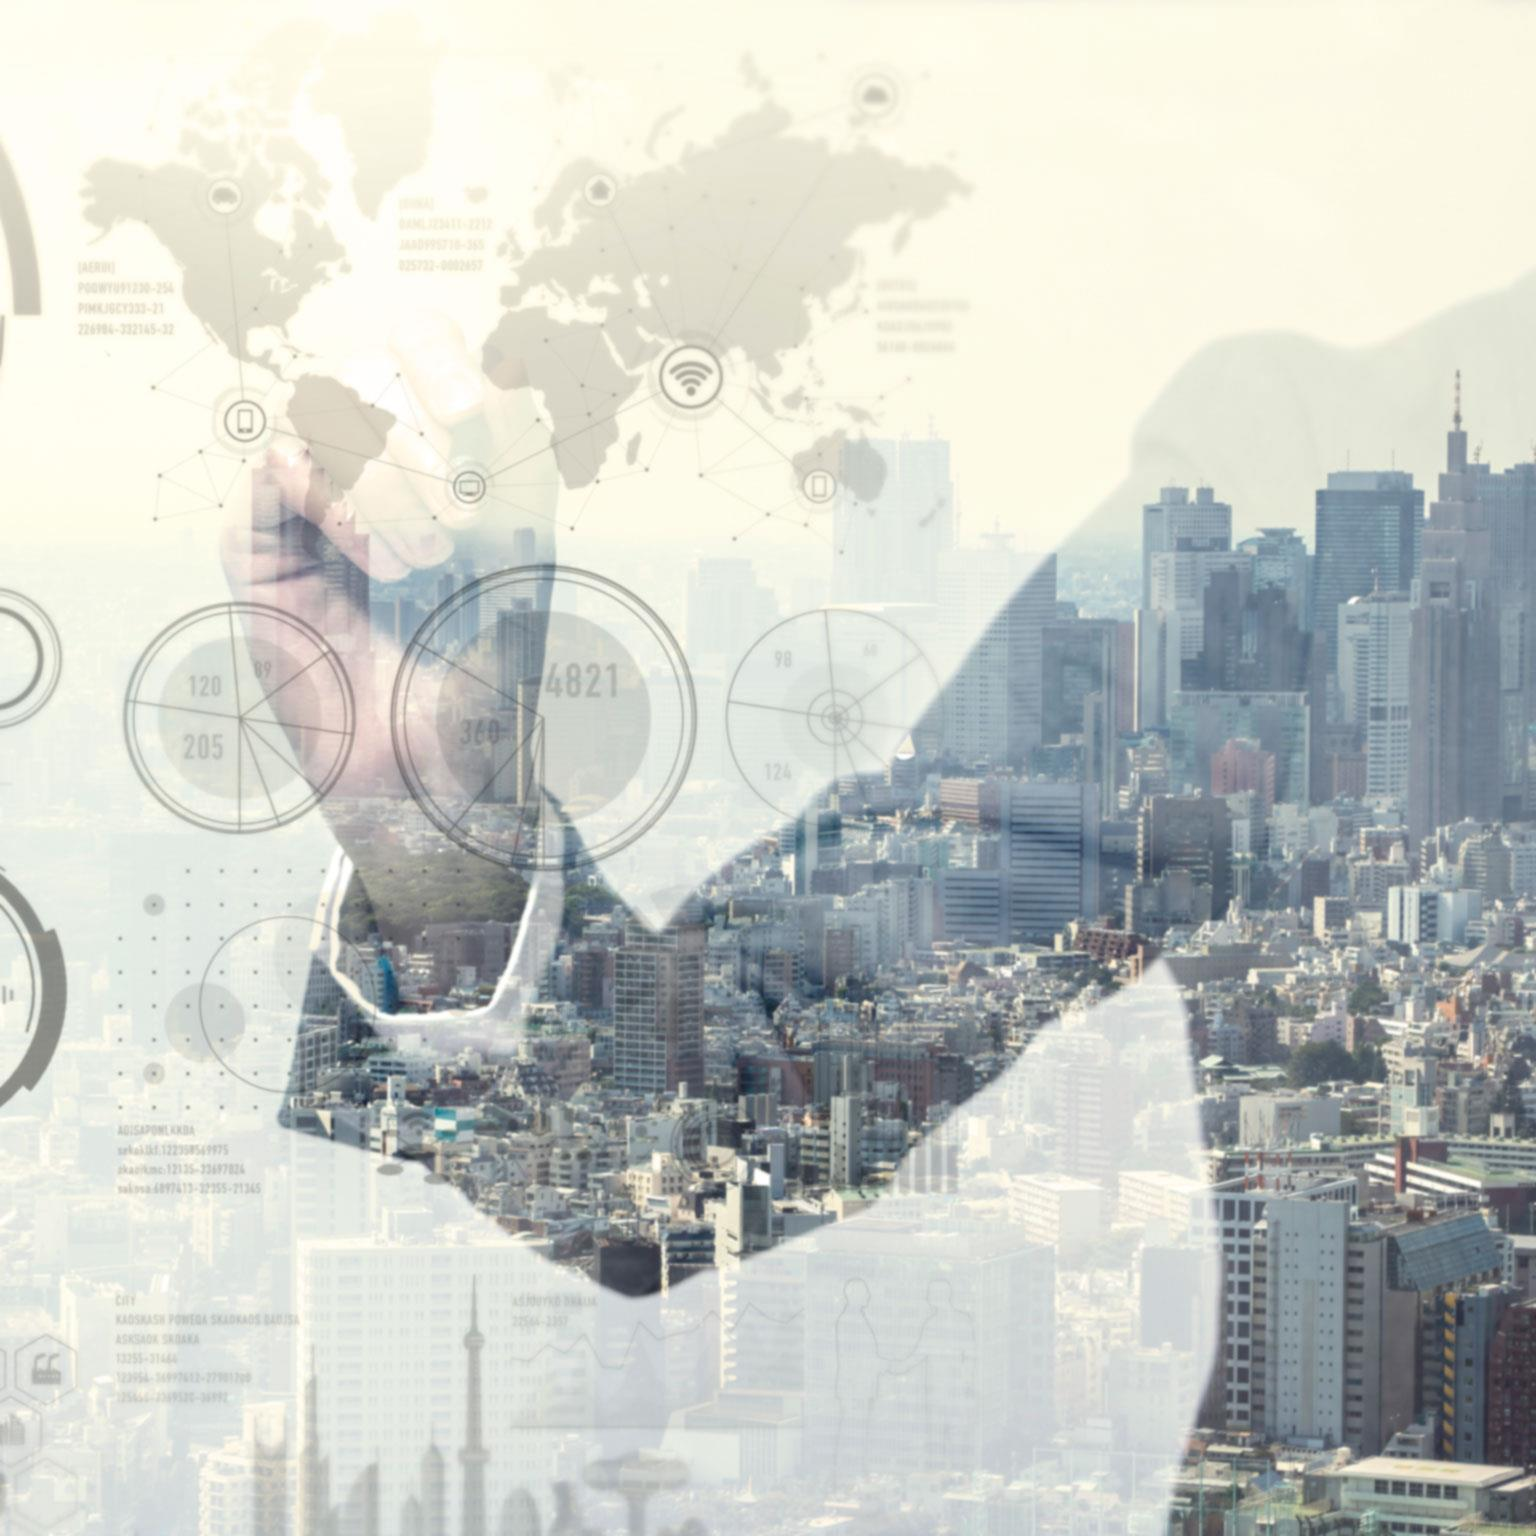 Manufacturing: Analytics unleashes productivity and profitability